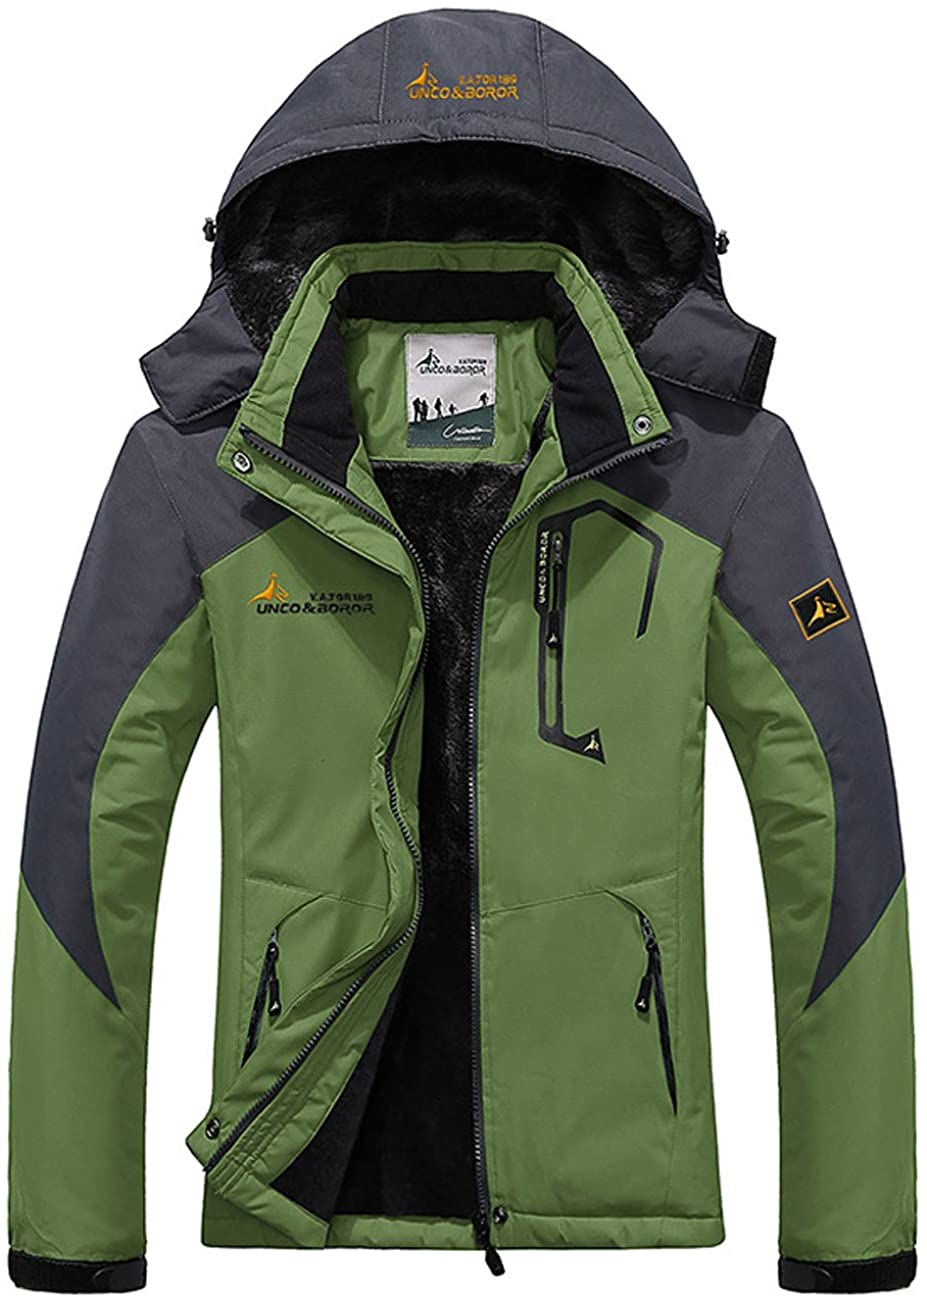 Women's Warm Waterproof Ski Jacket, Fleece Lined Detachable Hood Winter Coat Outdoor Windproof Parka